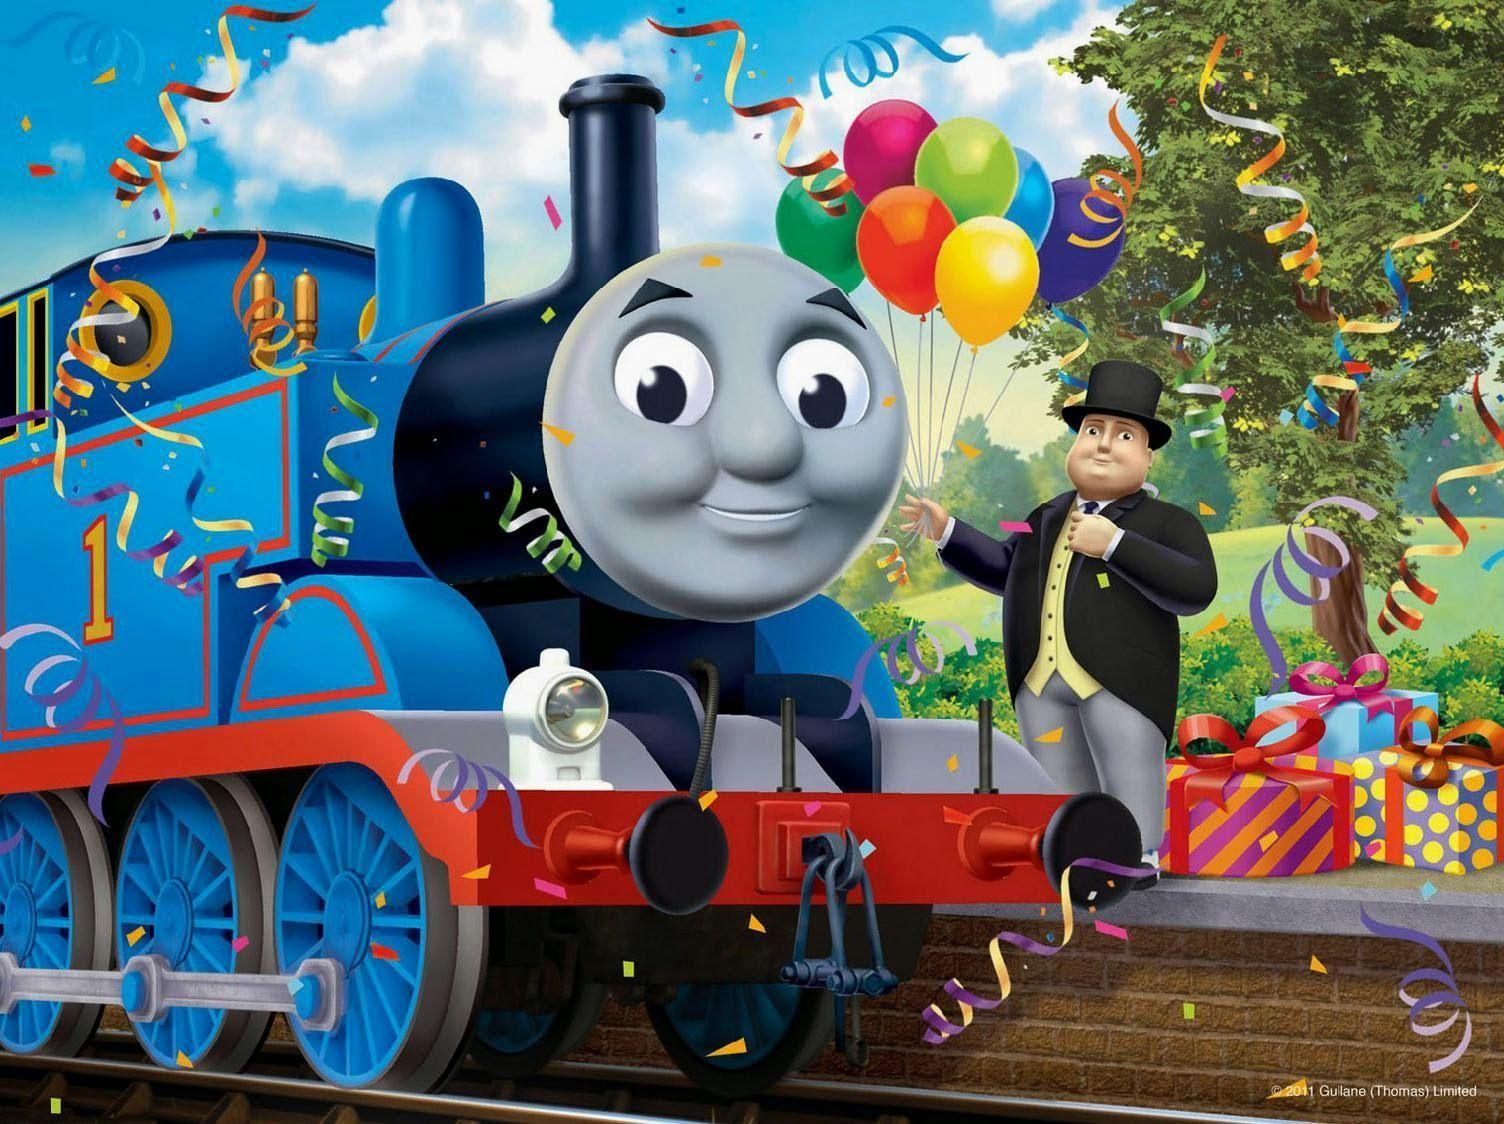 Thomas the Train Wallpapers - Top Free Thomas the Train ...